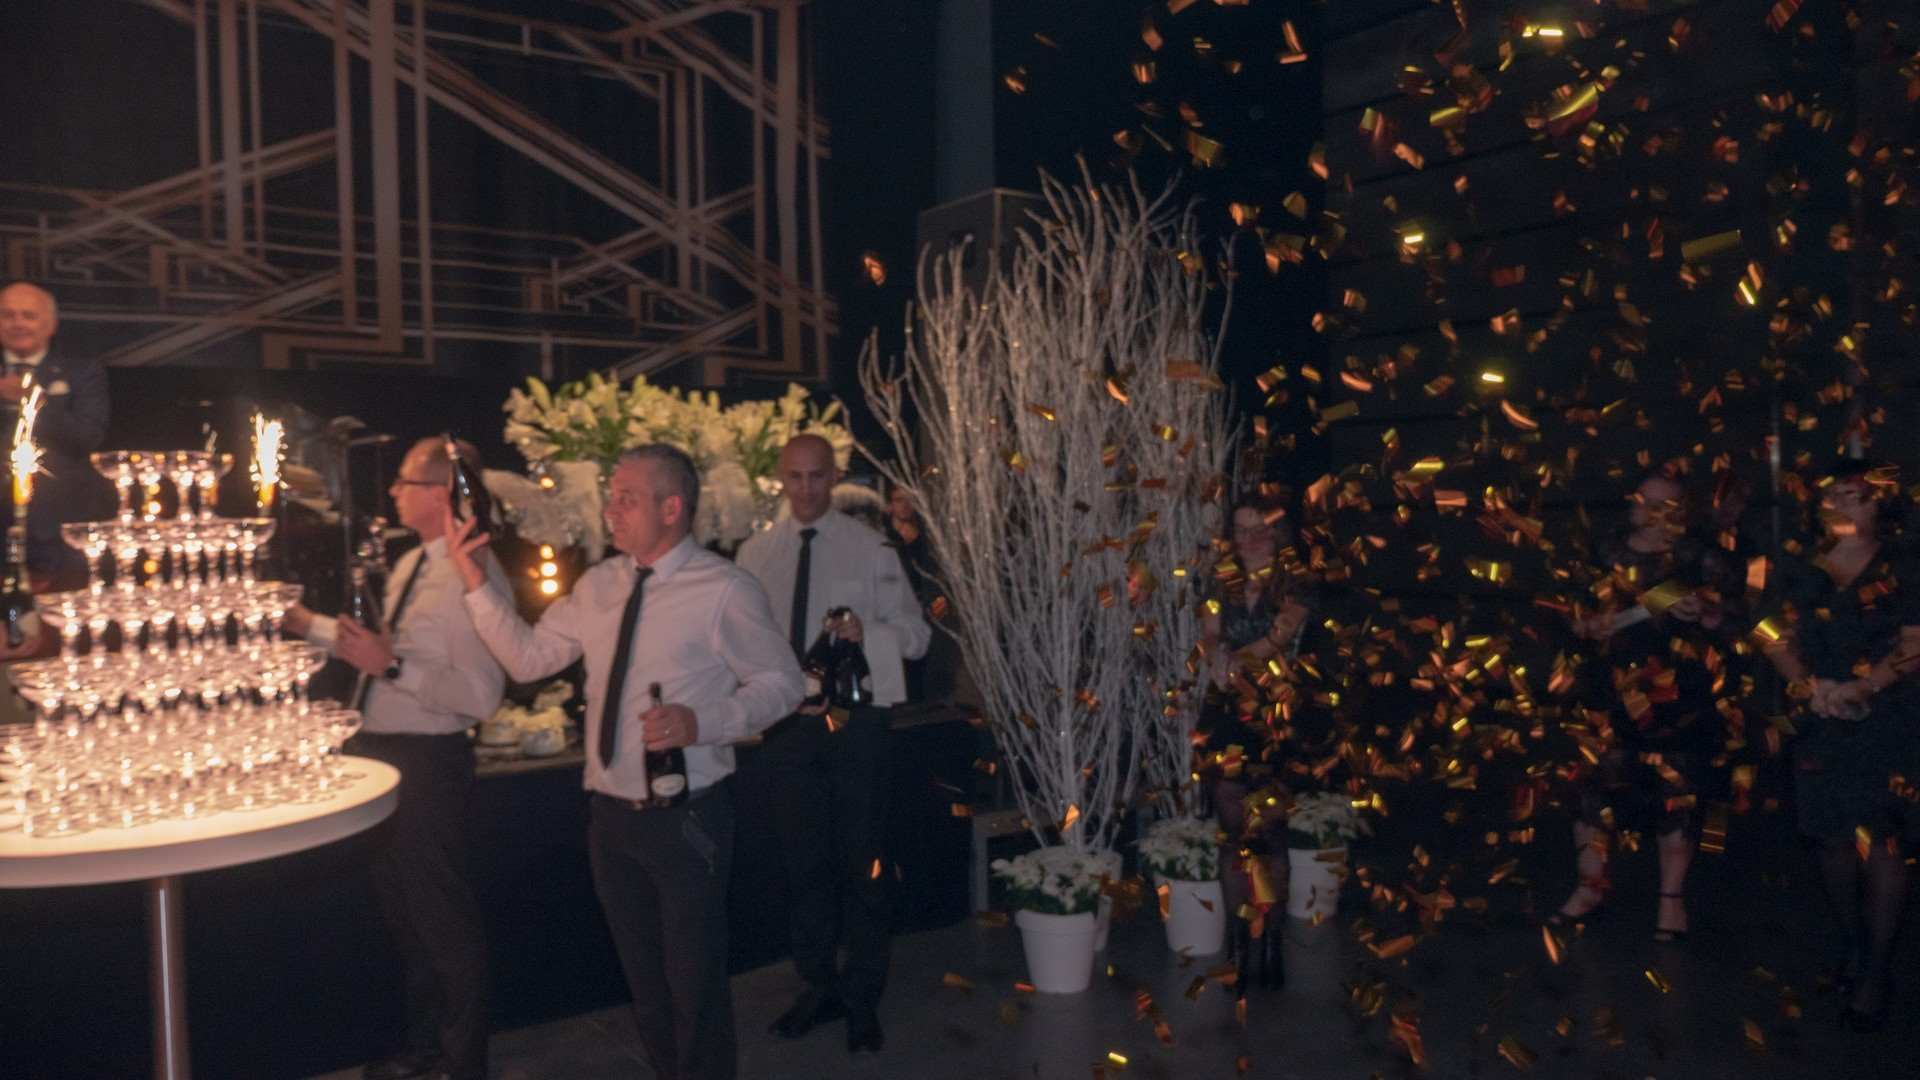 xmas-party-atoz-2018-champagne-gatsby-ambiance-luxembourg